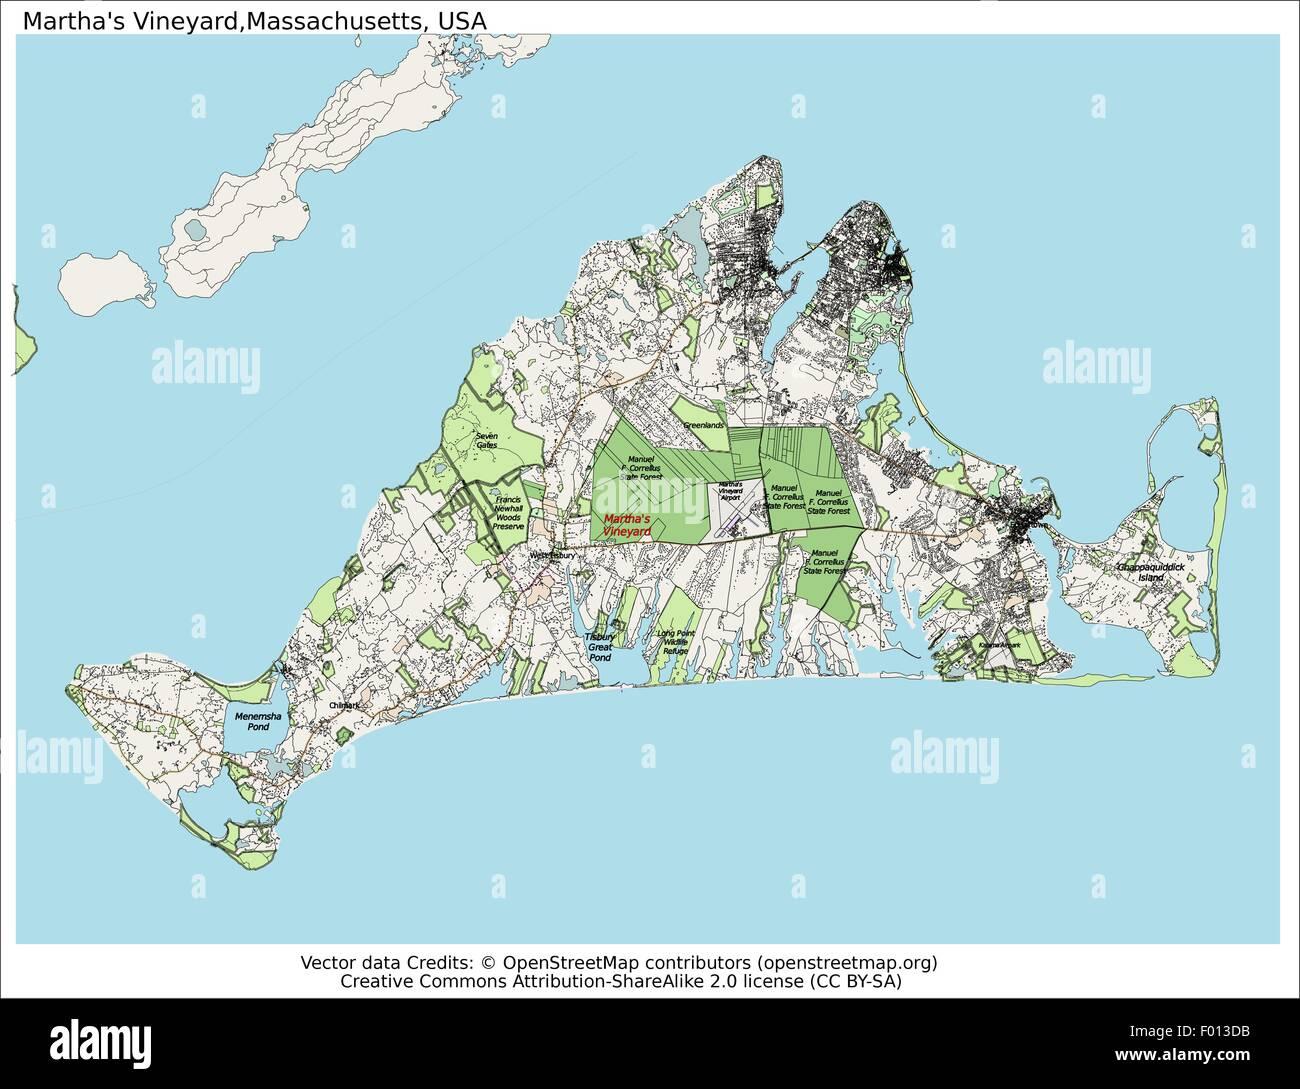 Marthas Vineyard Massachusetts USA Area City Map Aerial View - Massachusetts map usa